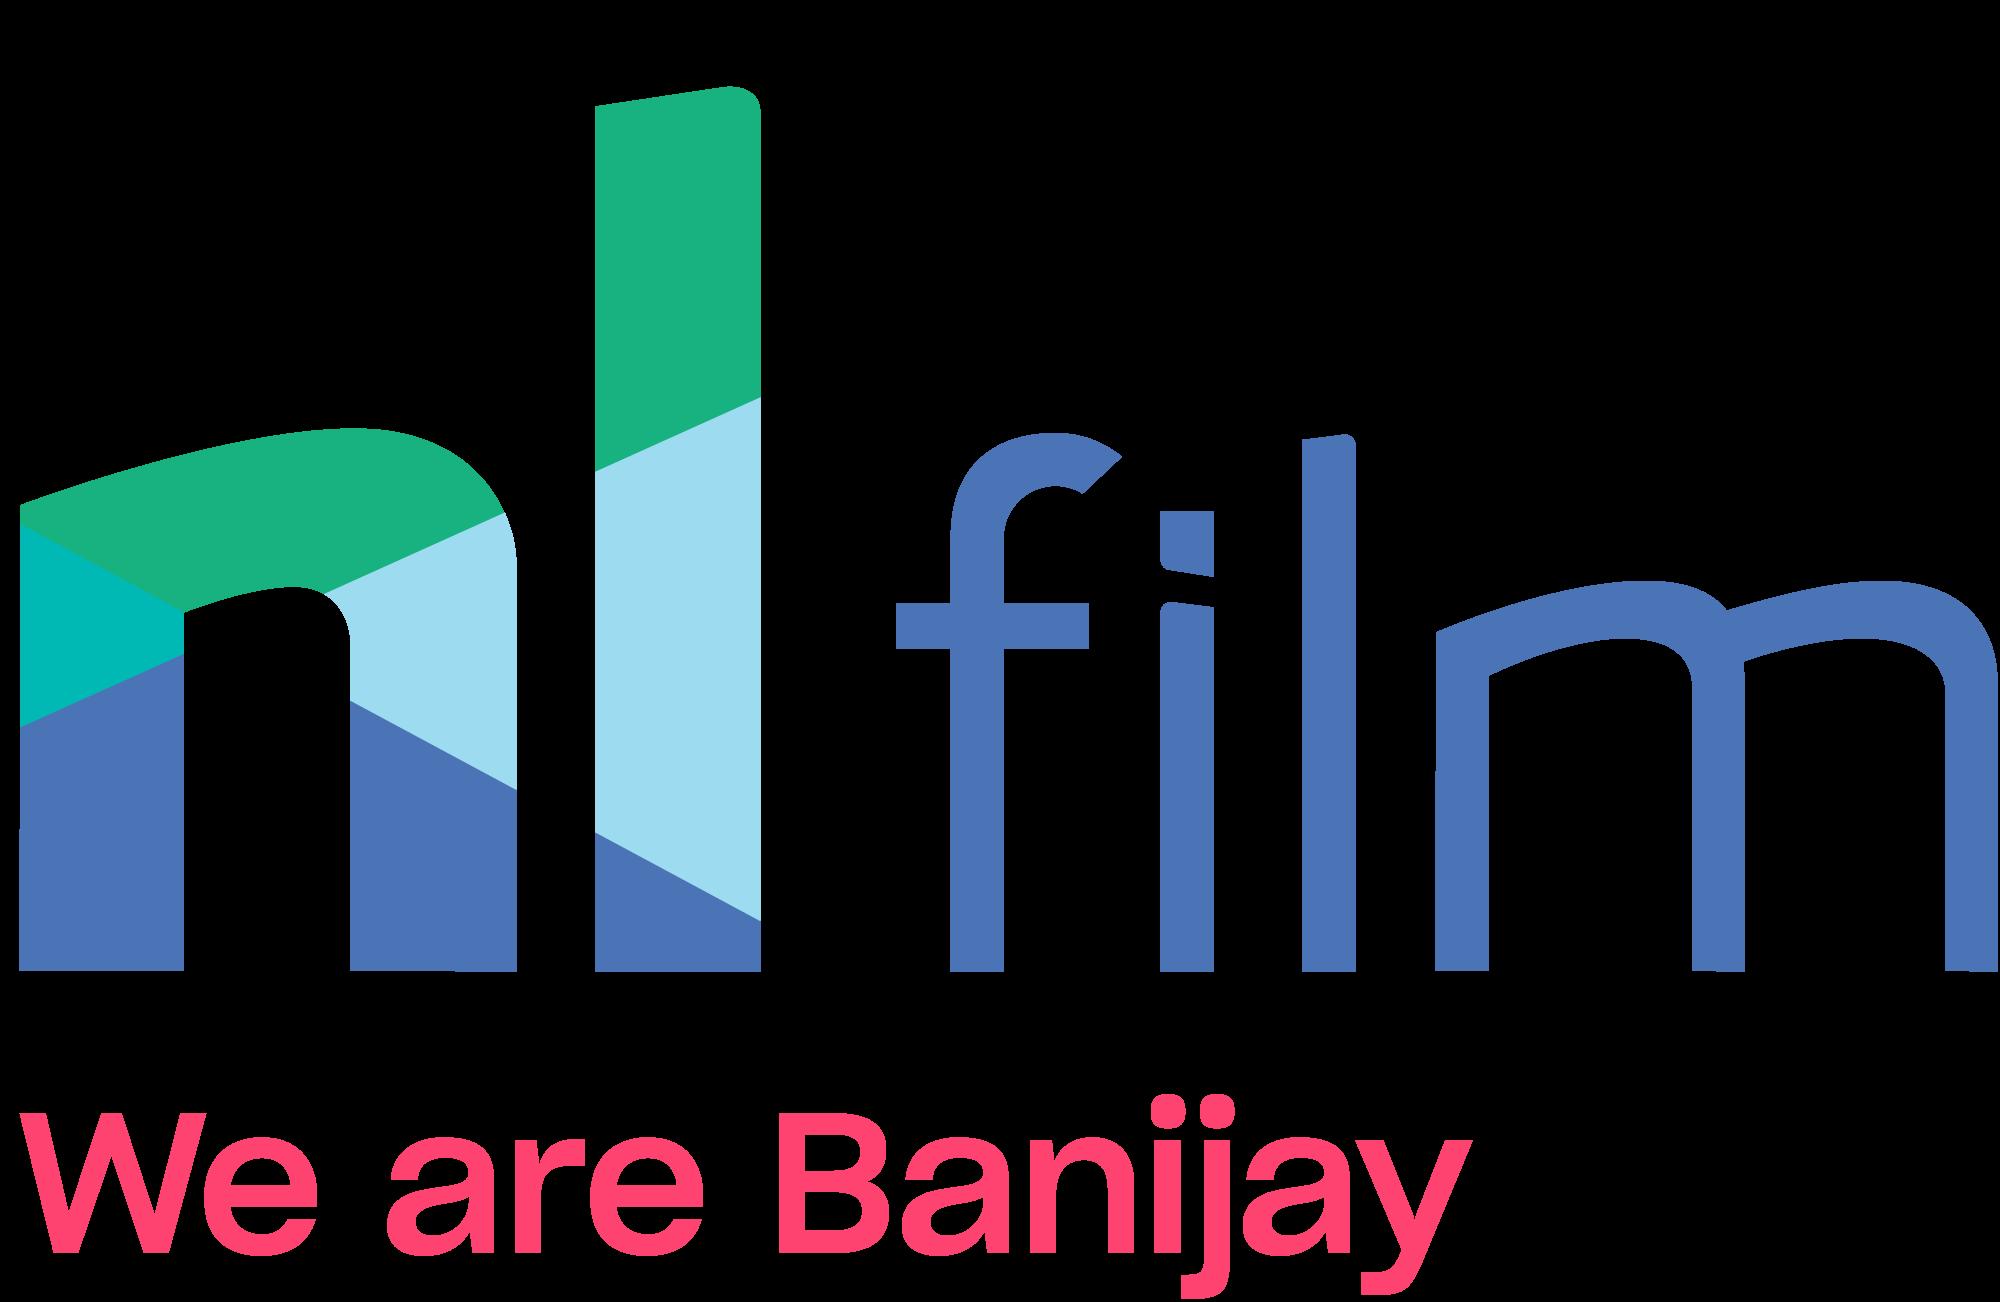 NL Film color logo